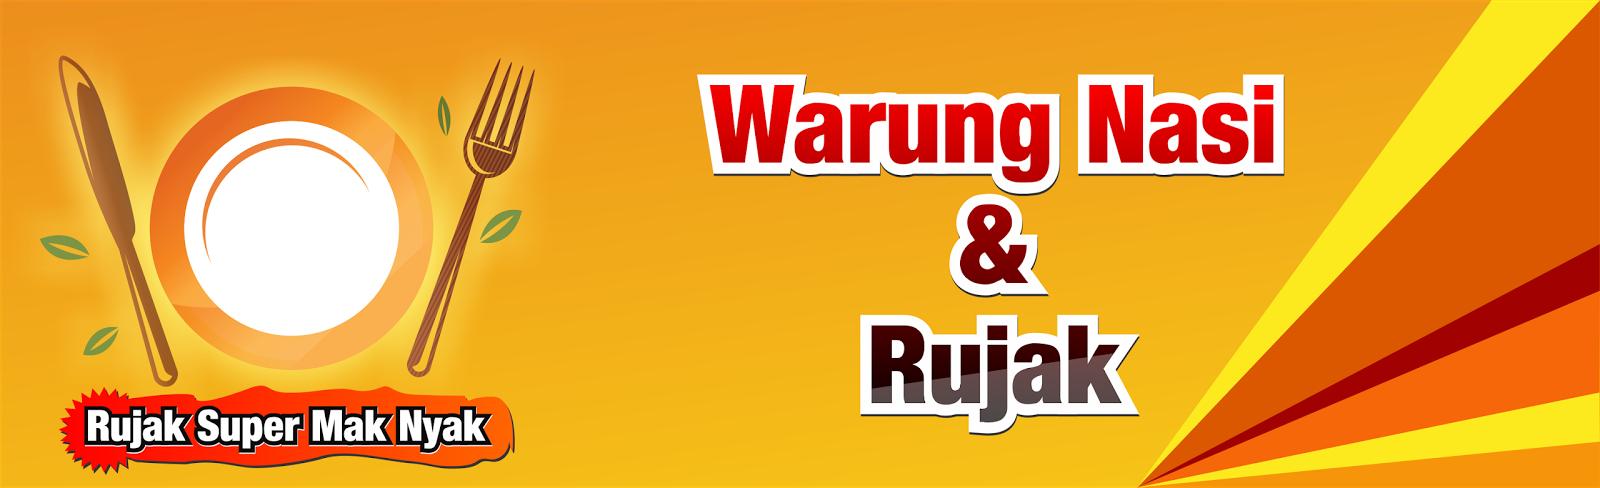 Gambar Desain Banner Warung Makan Cdr Mso Excel 101 Banner